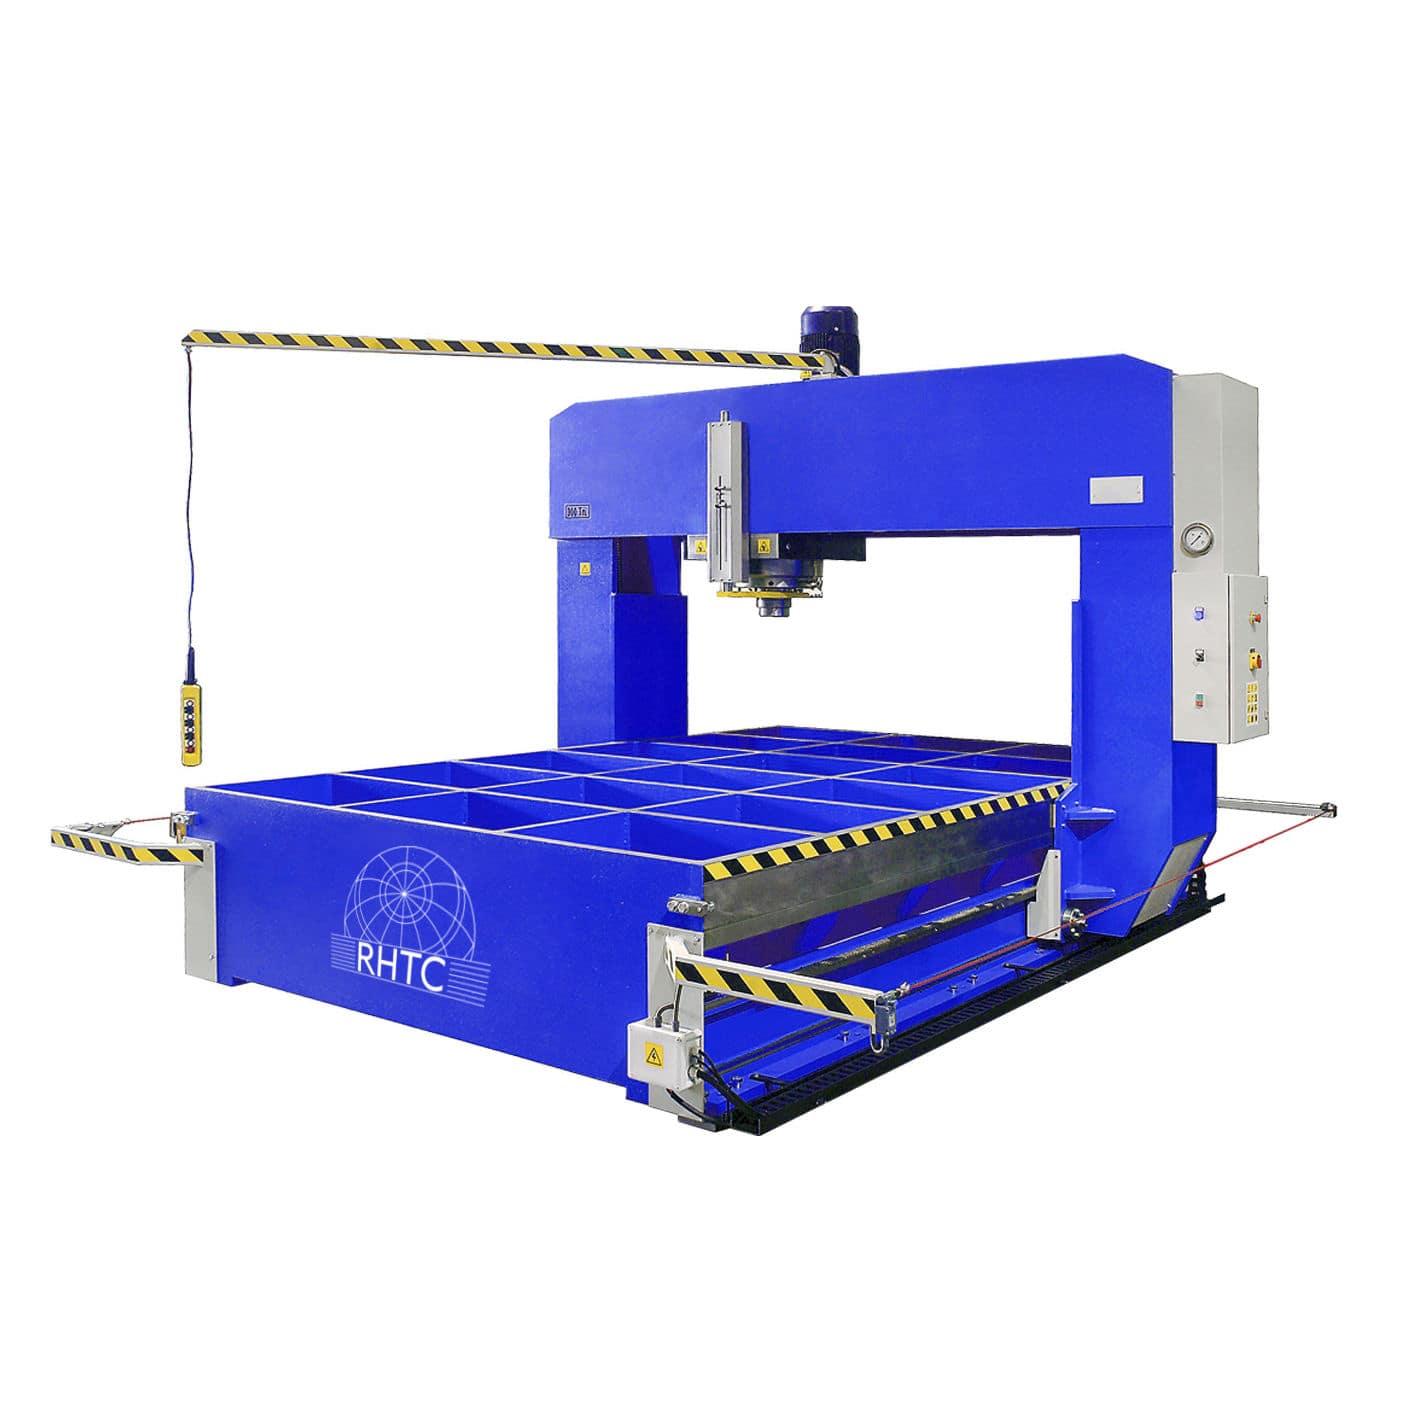 Portal press / hydraulic / forming / straightening - PPTL-300 - RHTC BV